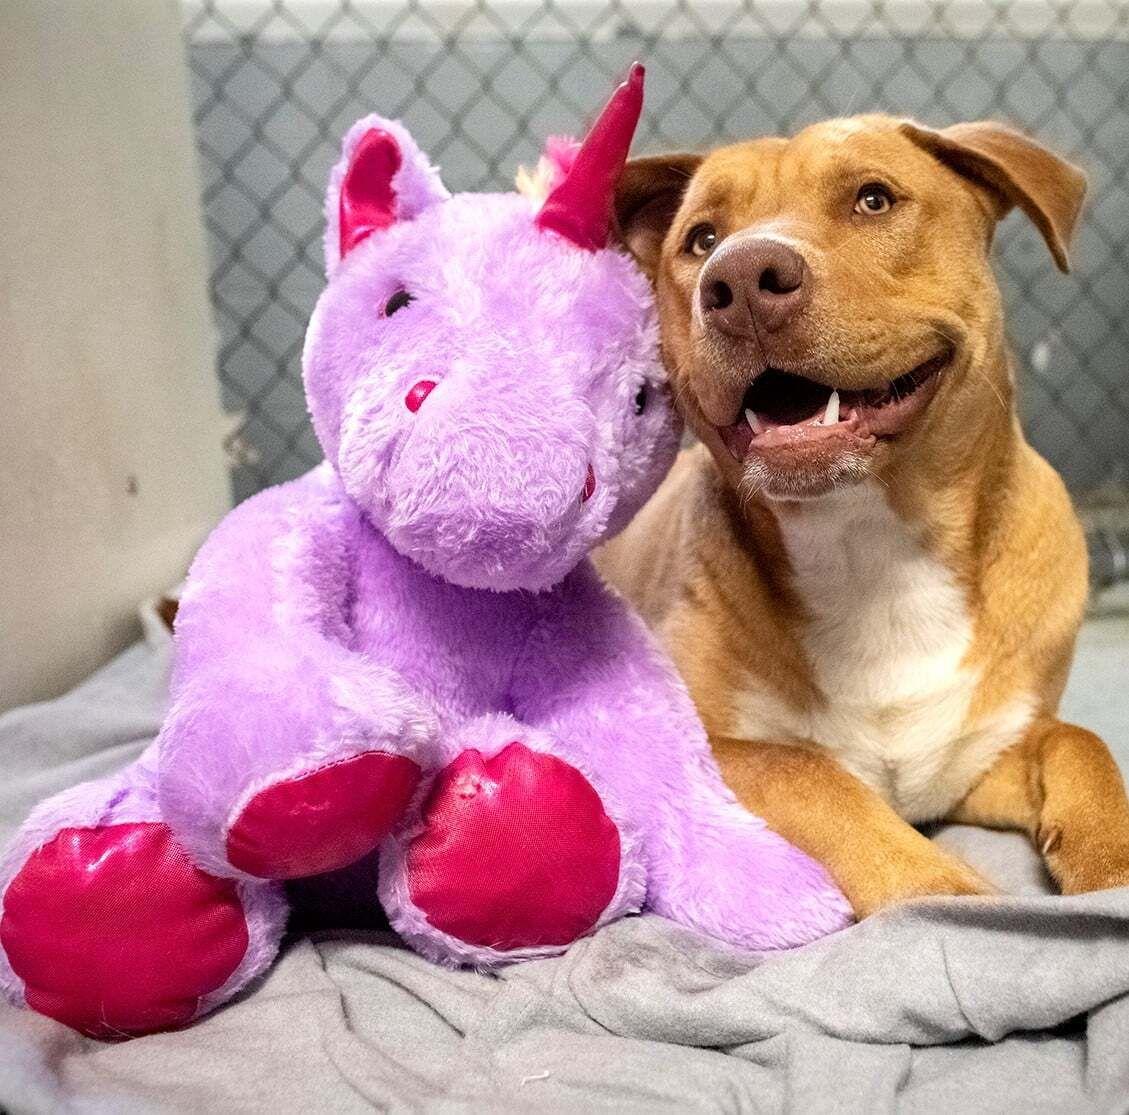 Sisu and his plush pal at the Duplin County animal shelter.